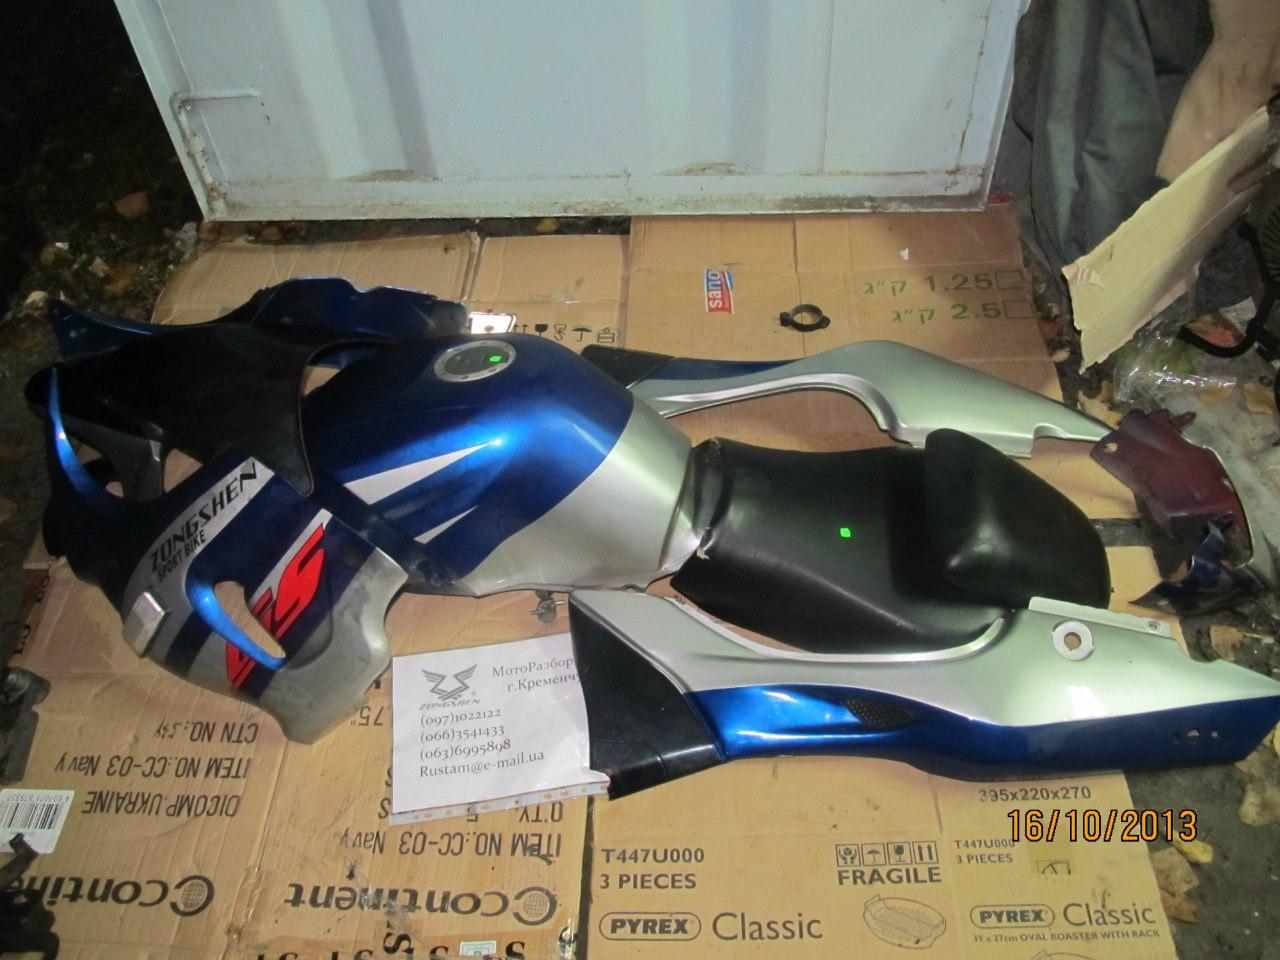 МотоРазборка г.Кременчуг Zongshen 200-250, Suzuki bandit 400-1, Venom 200 9x5wg1Ryfzw